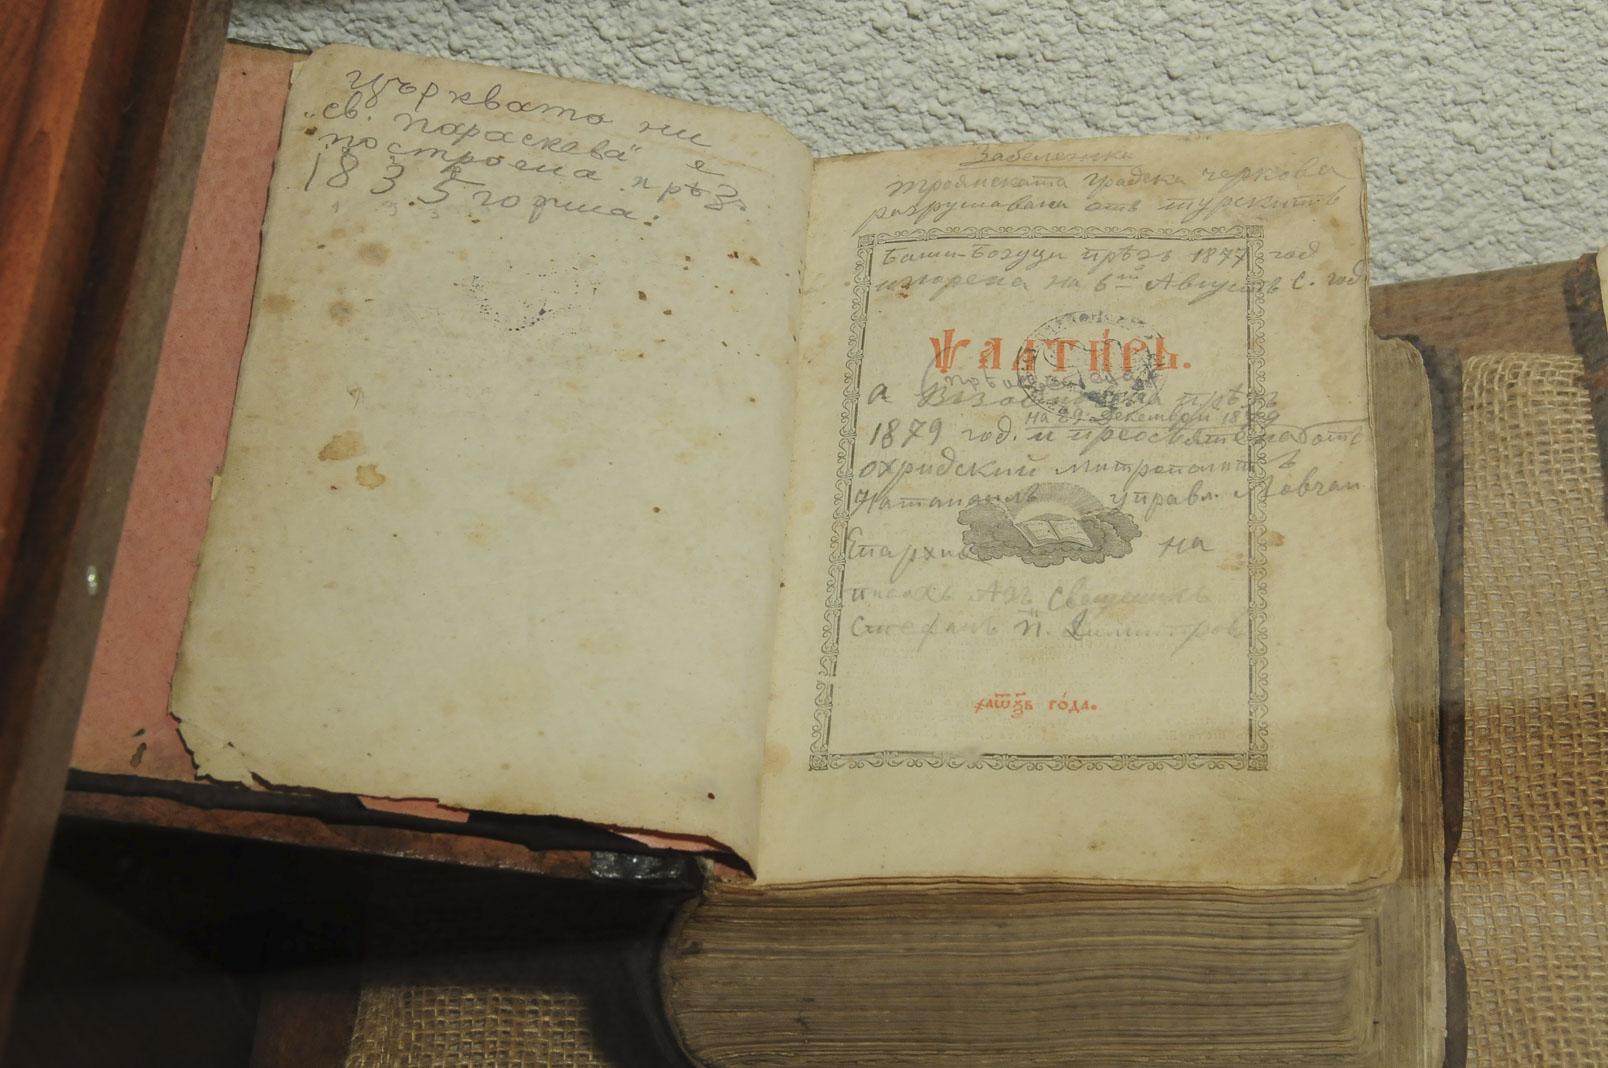 troyan-museum-180-godini-hram-cveta-paraskeva-3